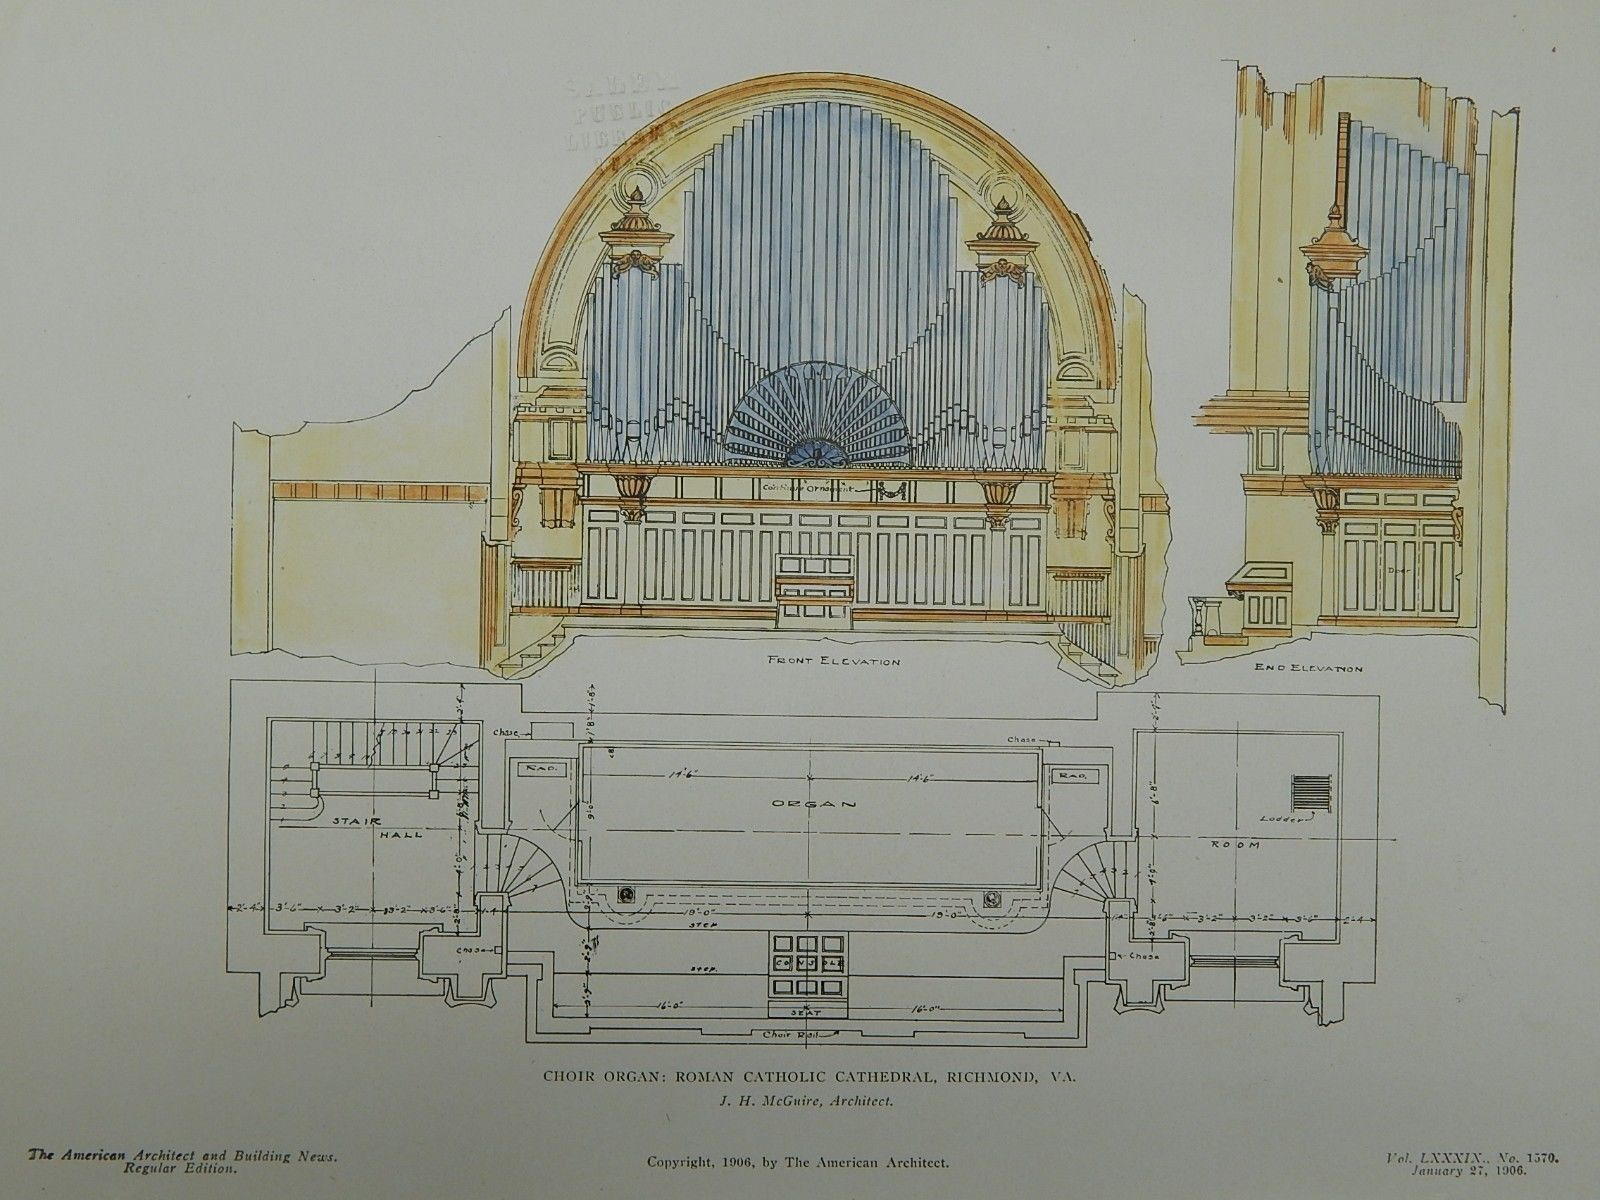 Choir Organ, Roman Catholic Church, Richmond, VA, 1906, Original Plan. J. H. McGuire.